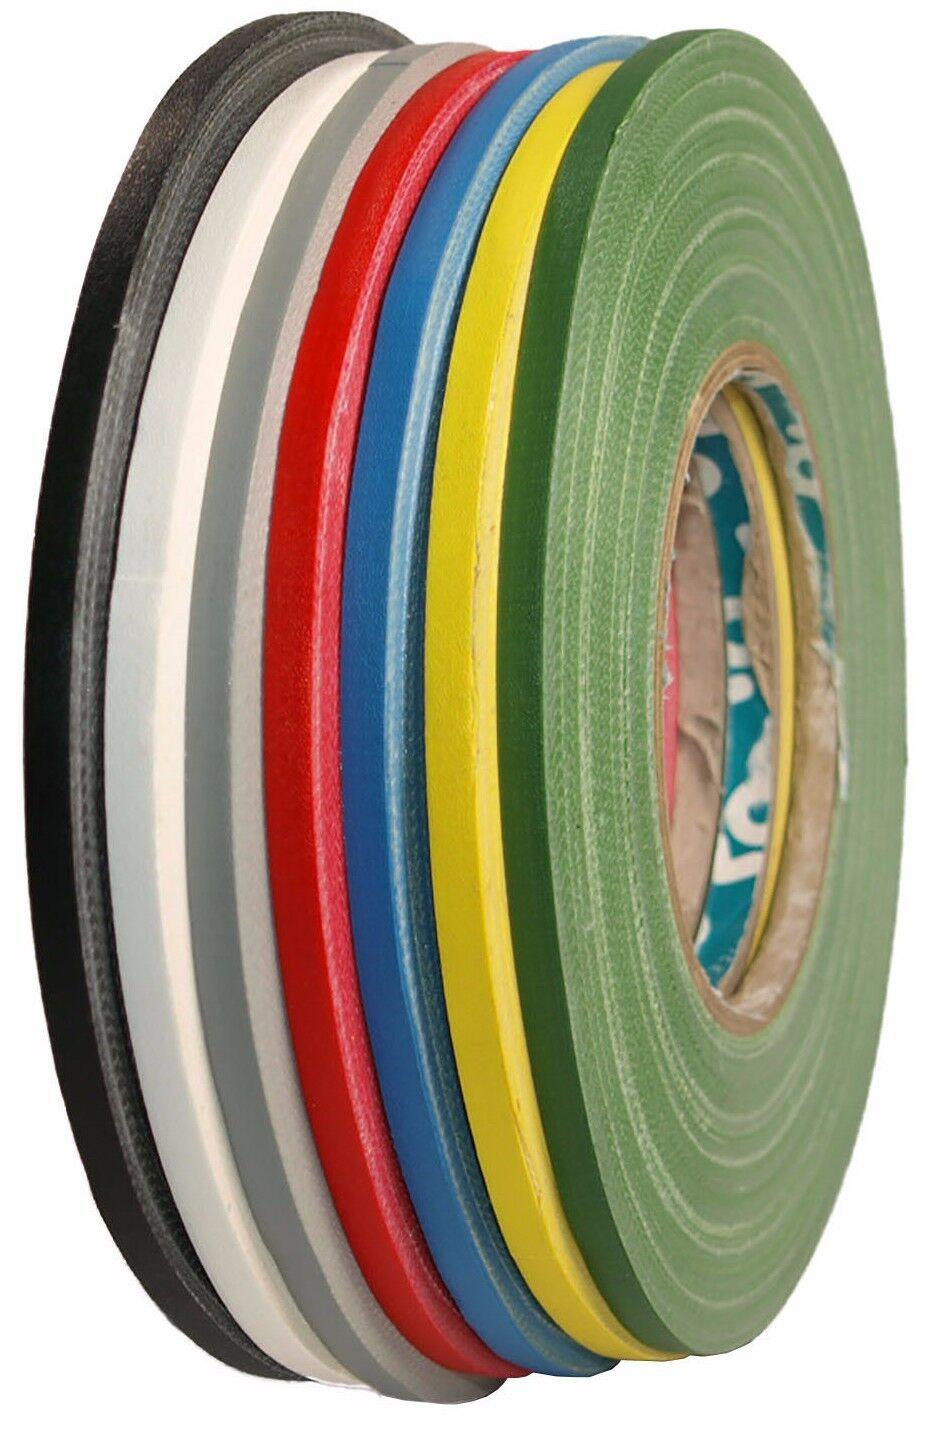 AT159 Gewebeband matt 12mm x 50m Gaffa® Tape Fine Line Klebeband schmal farbig